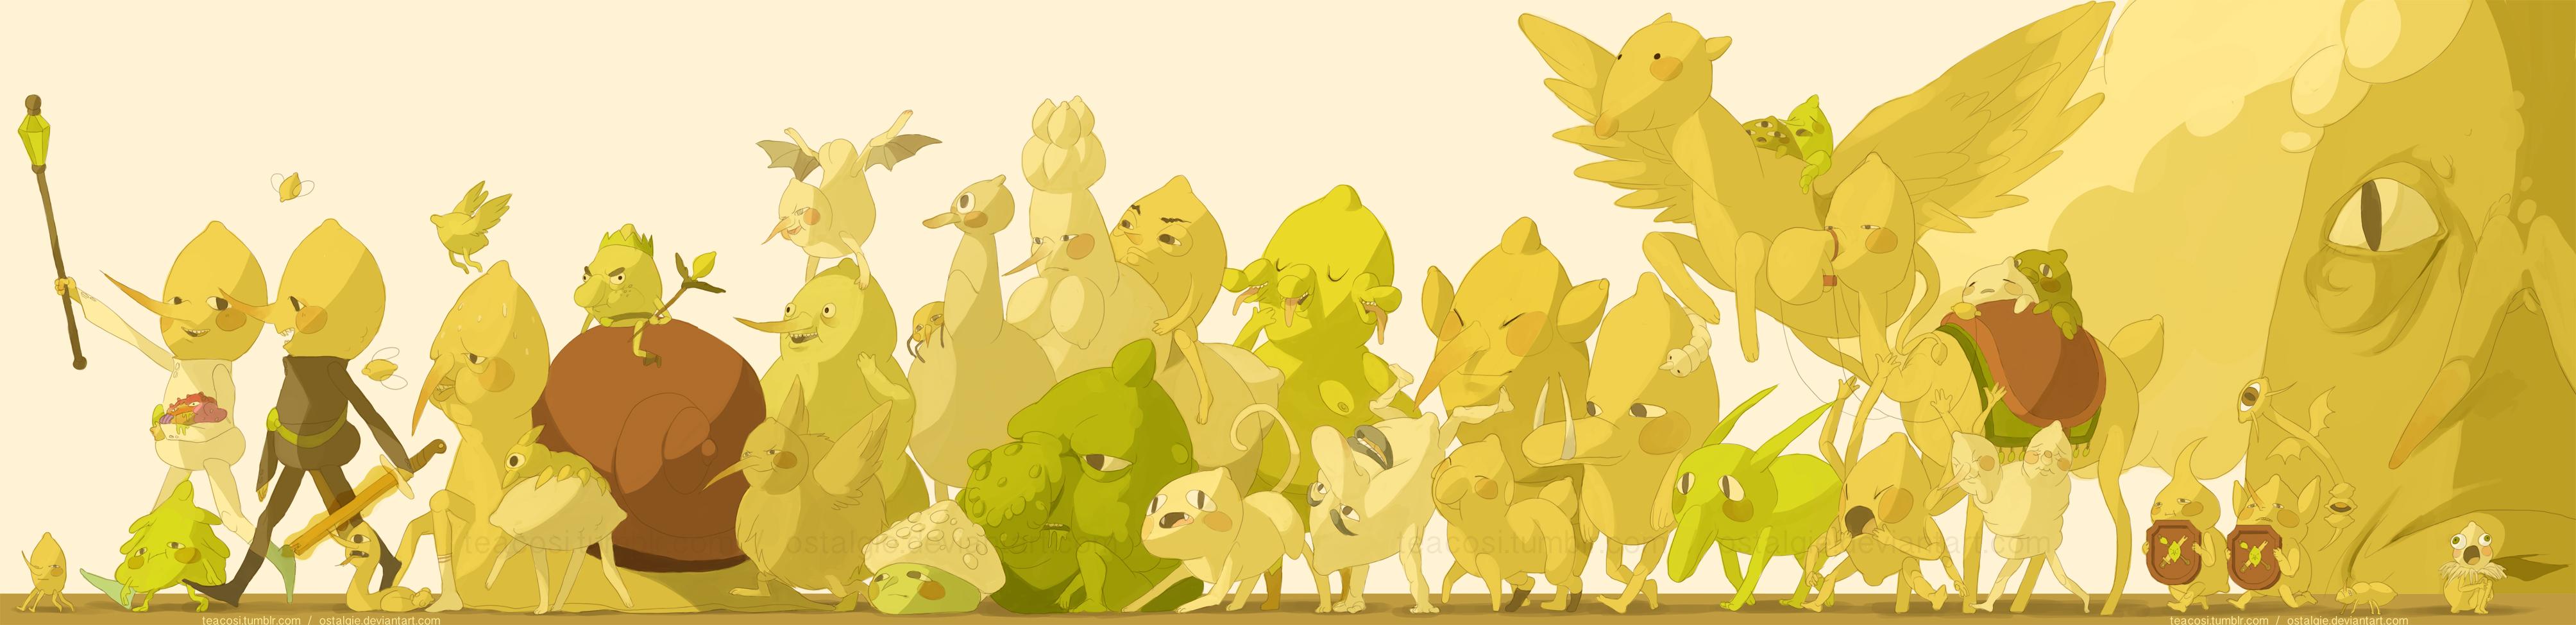 the big lemongrab family by ostalgie